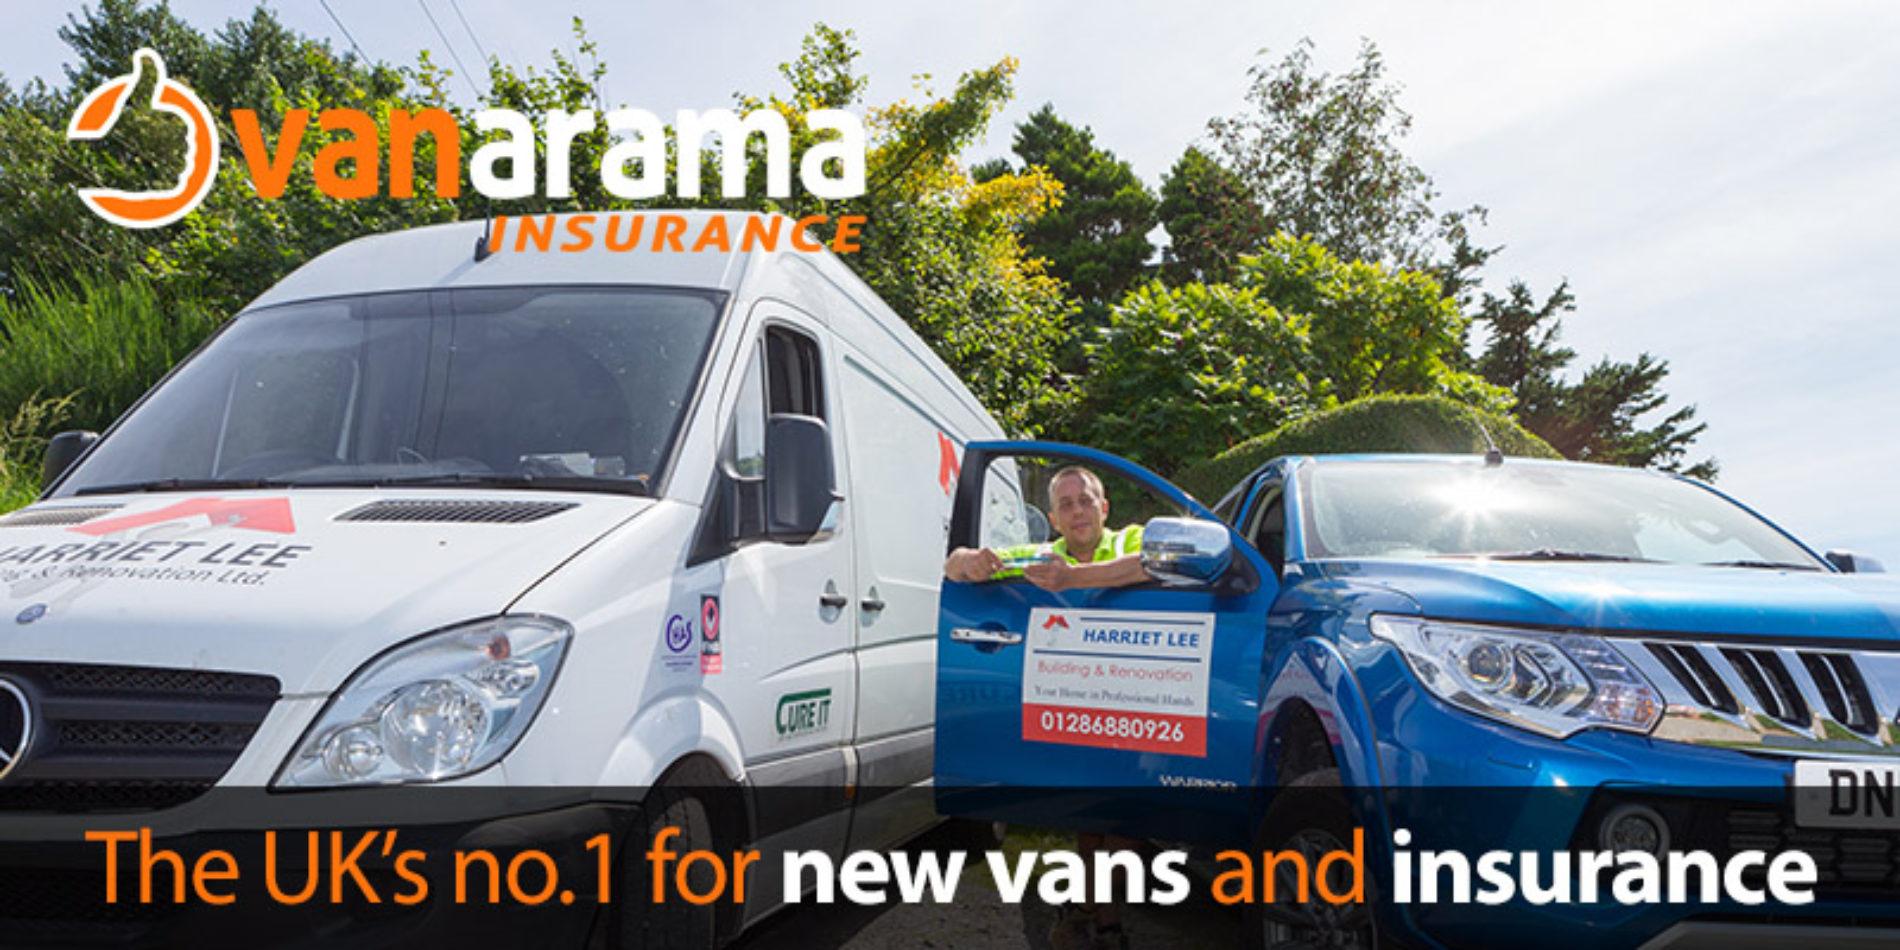 Sponsors – Vanarama Insurance